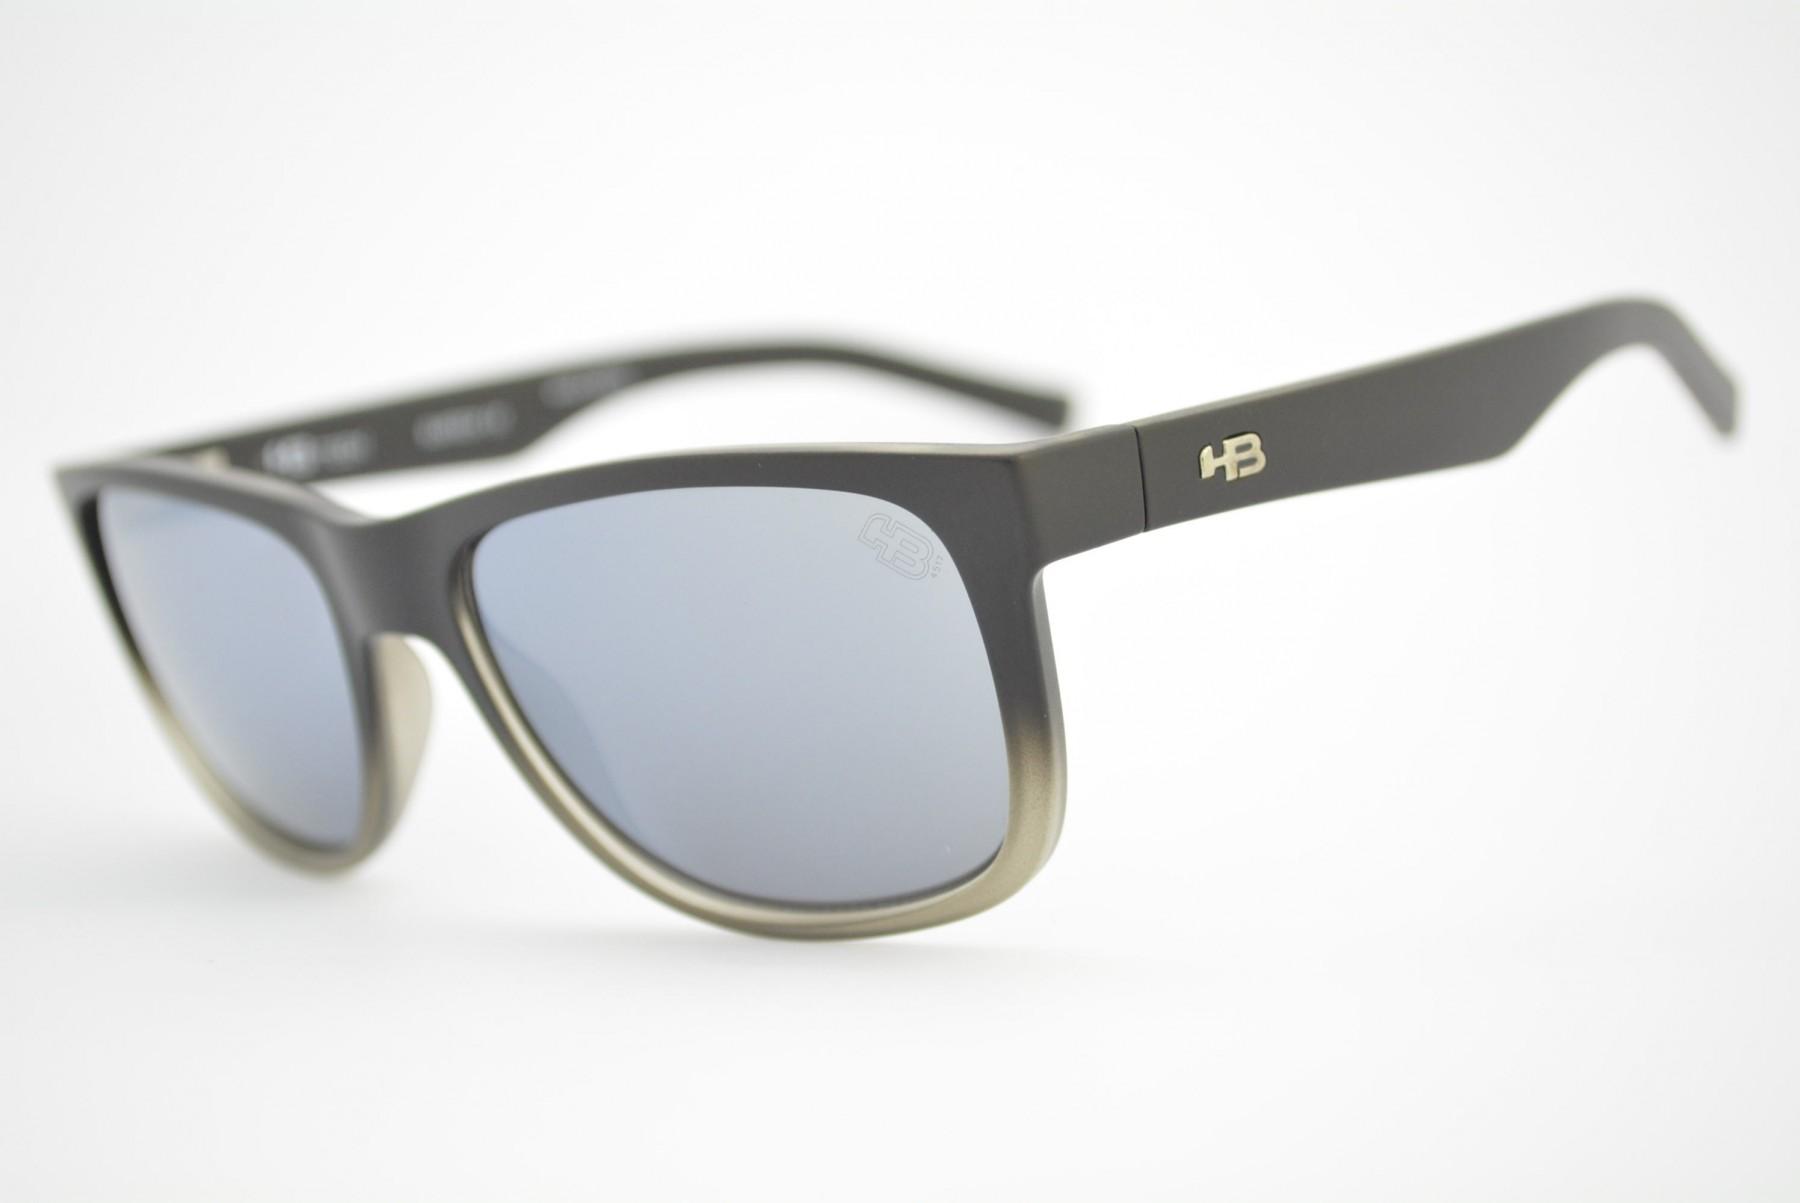 óculos de sol HB Teen mod 93132869 Ótica Cardoso 0a13c8b323